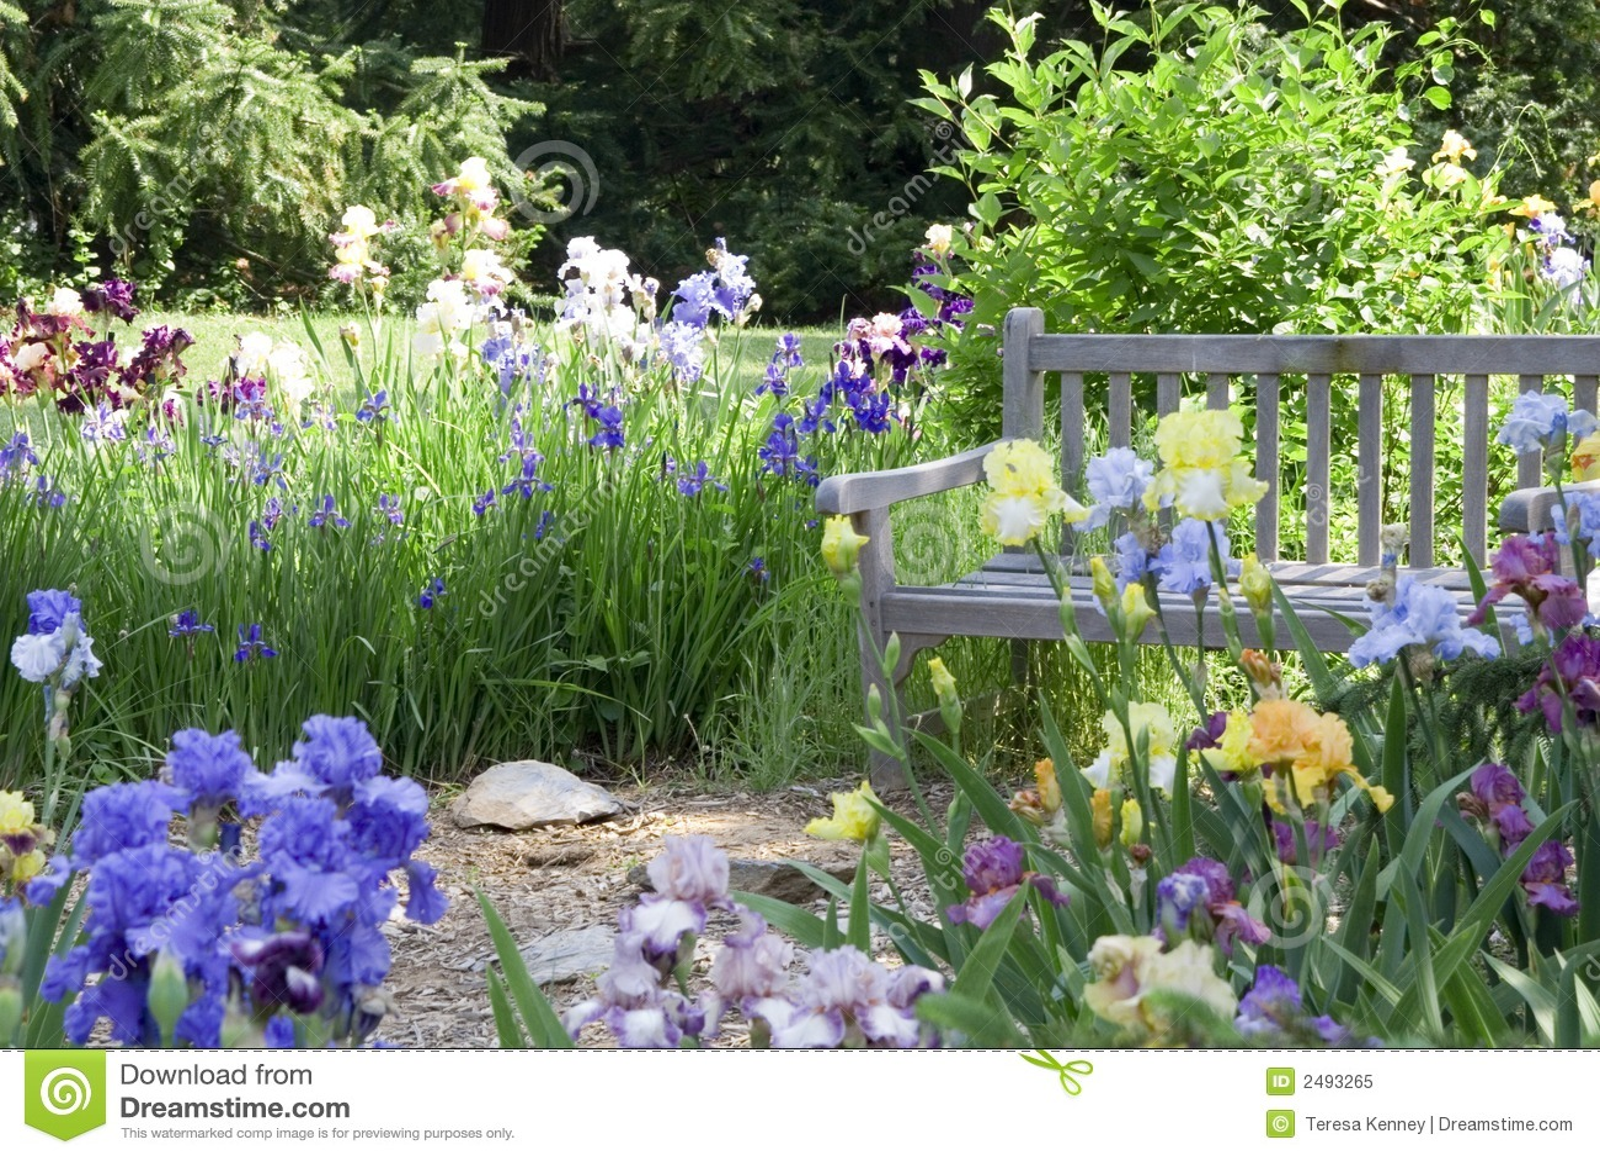 Flower Garden Royalty Free Stock Photo - Image: 2493265